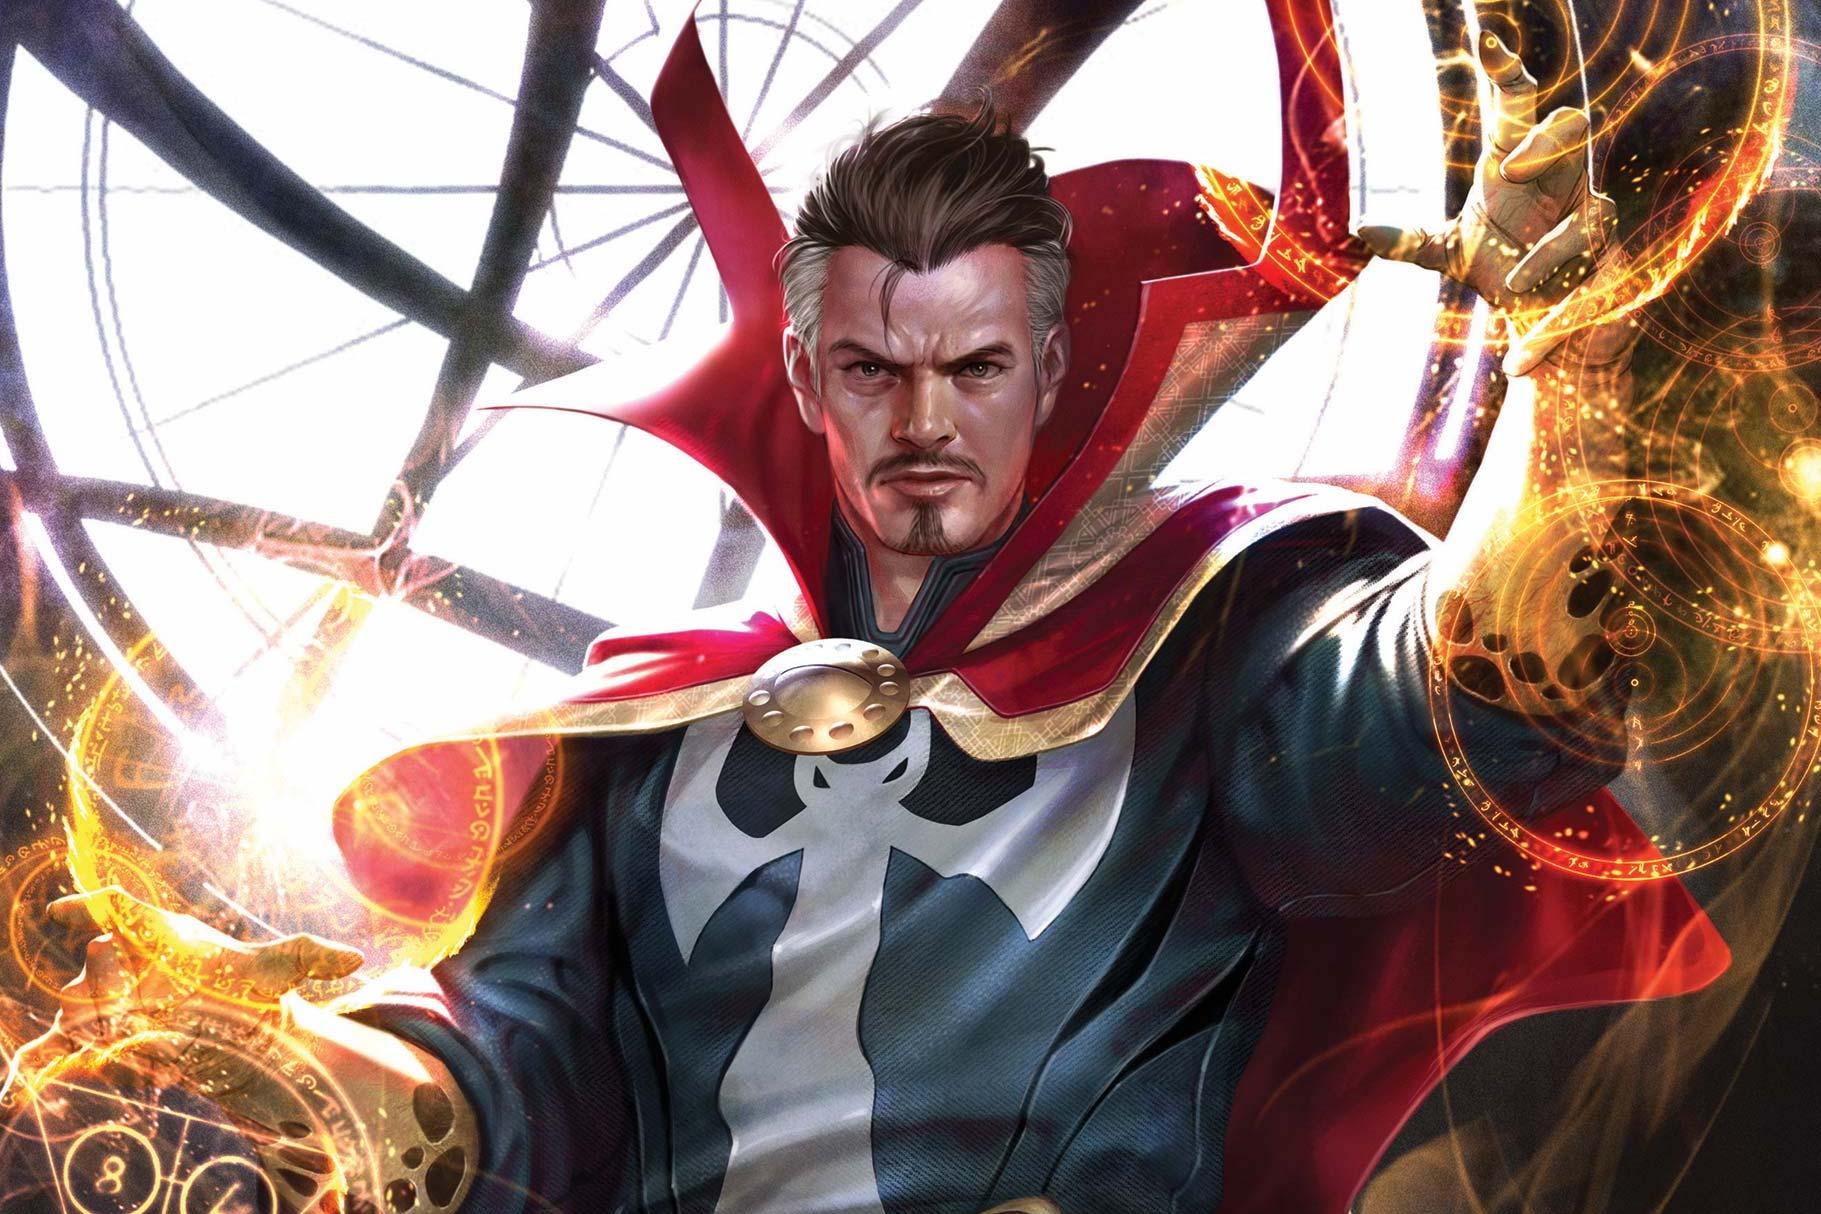 Doctor Strange wields his mystical arts in the Sanctum Sanctorum on the cover of Marvel Tales: Doctor Strange, Marvel Comics (2020).